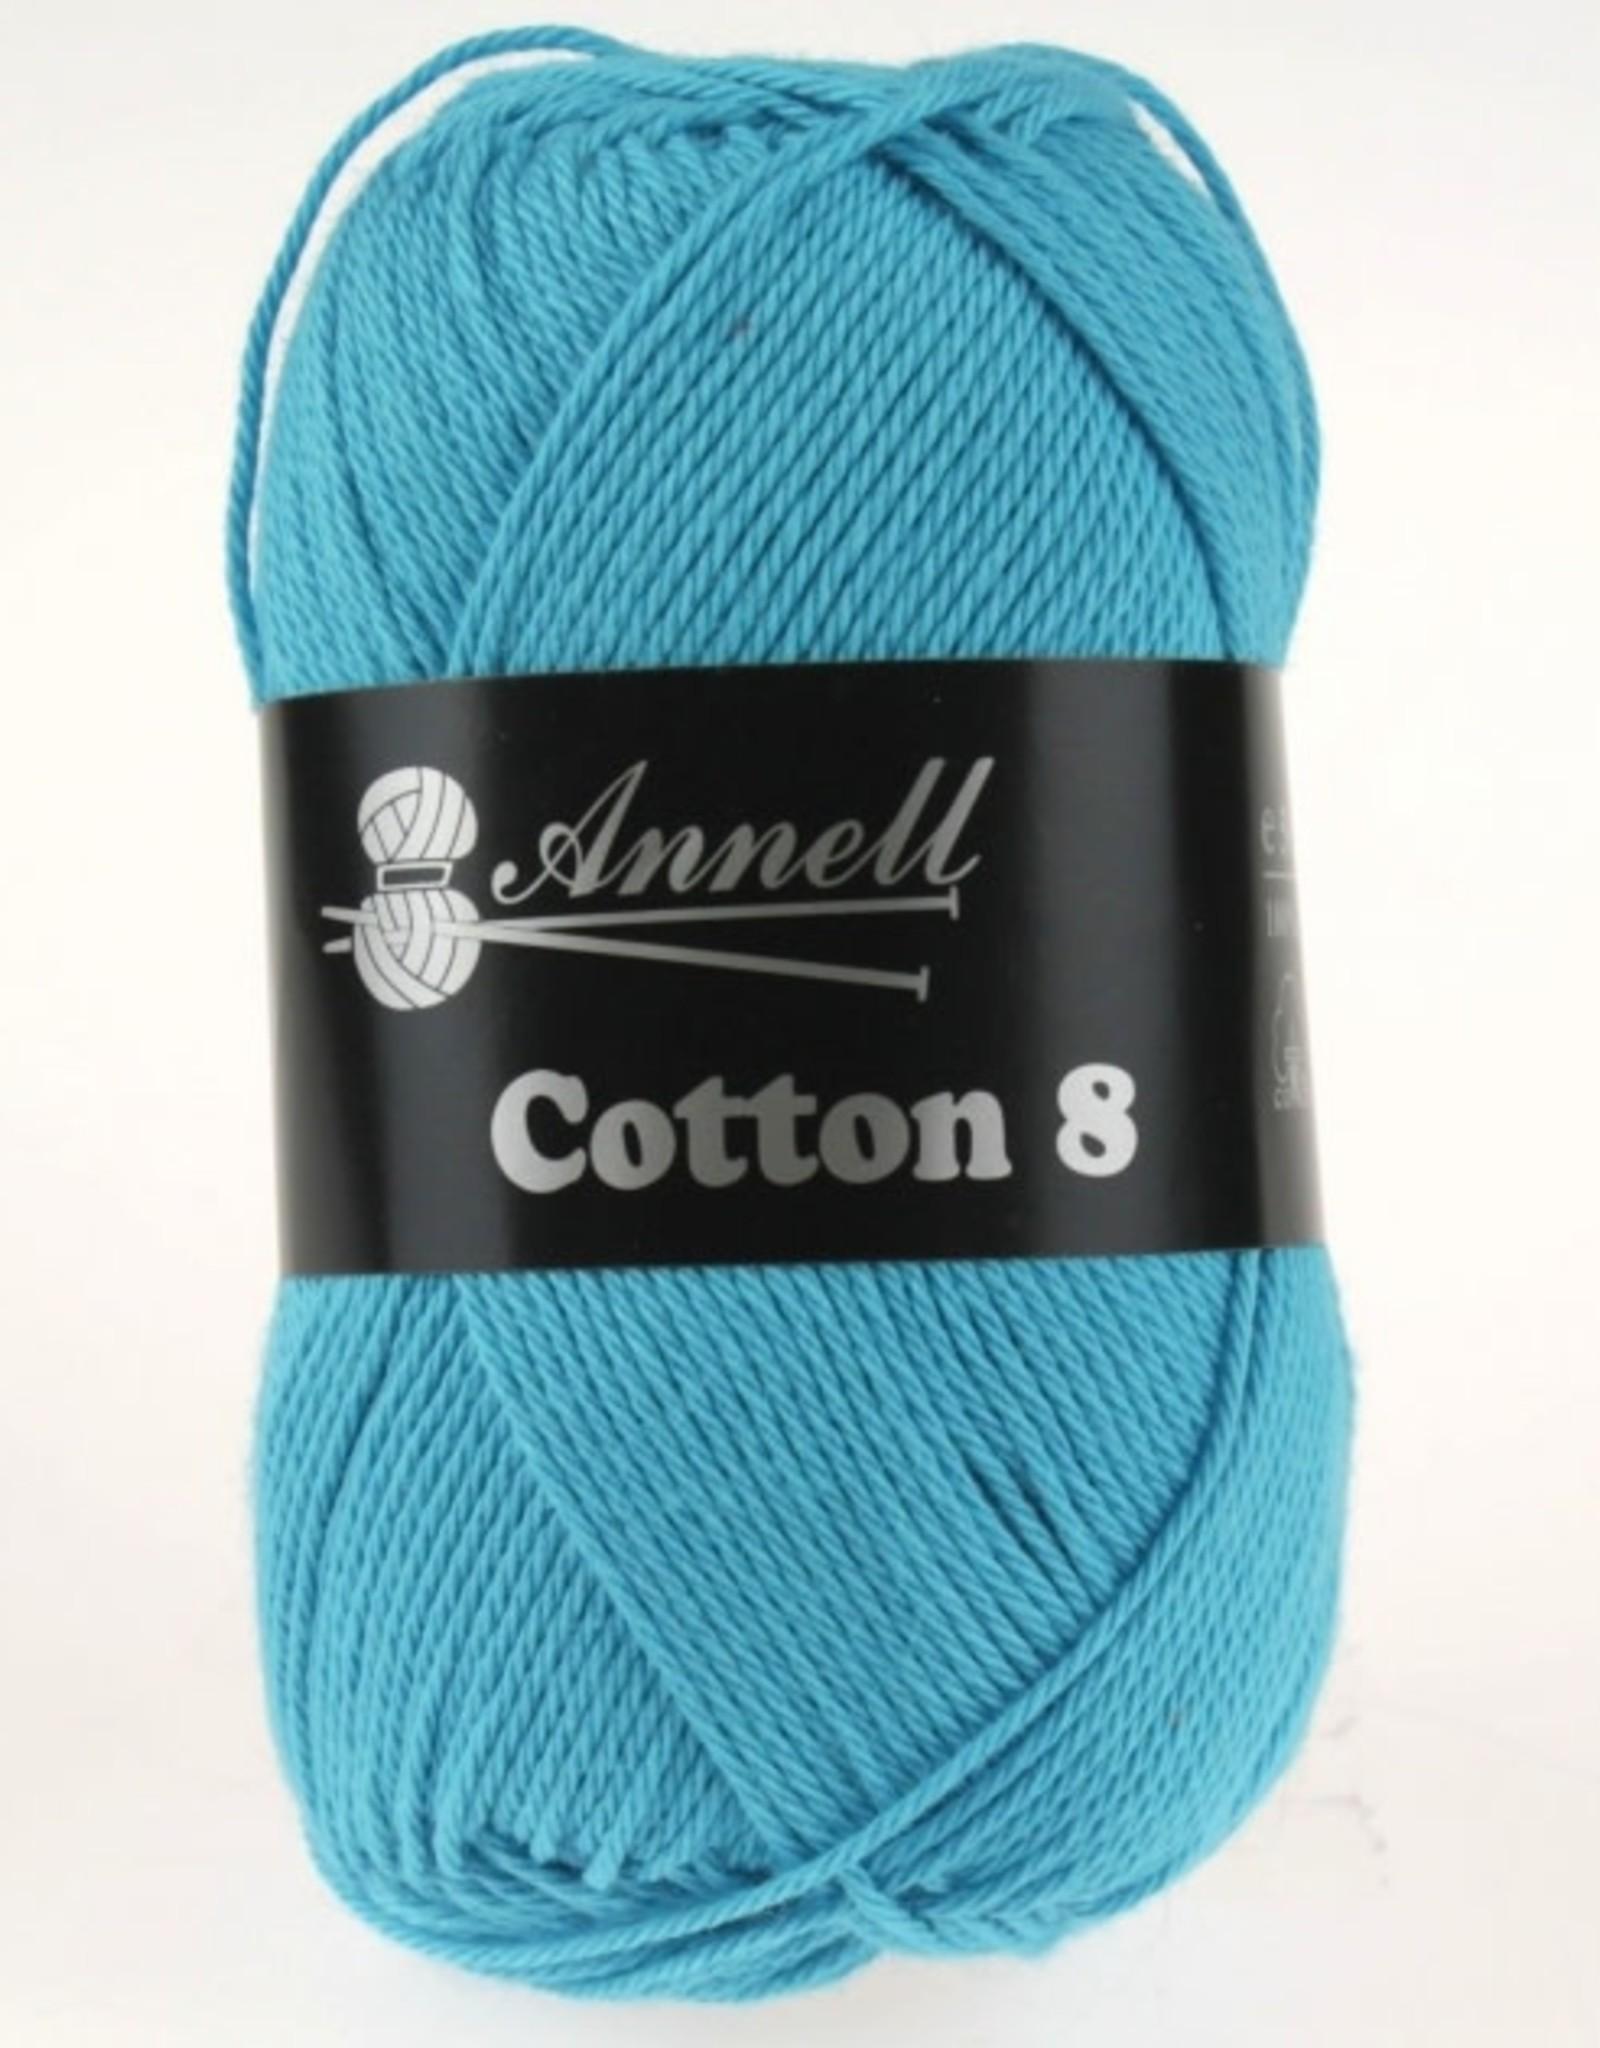 Annell Annell Cotton 8 40